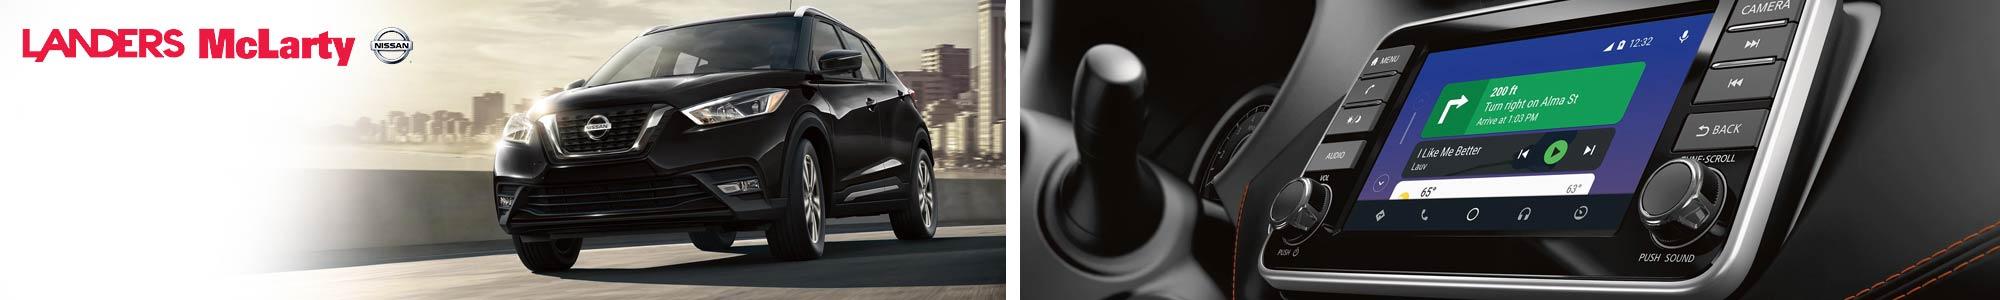 2020 Nissan Kicks Interior and Exterior